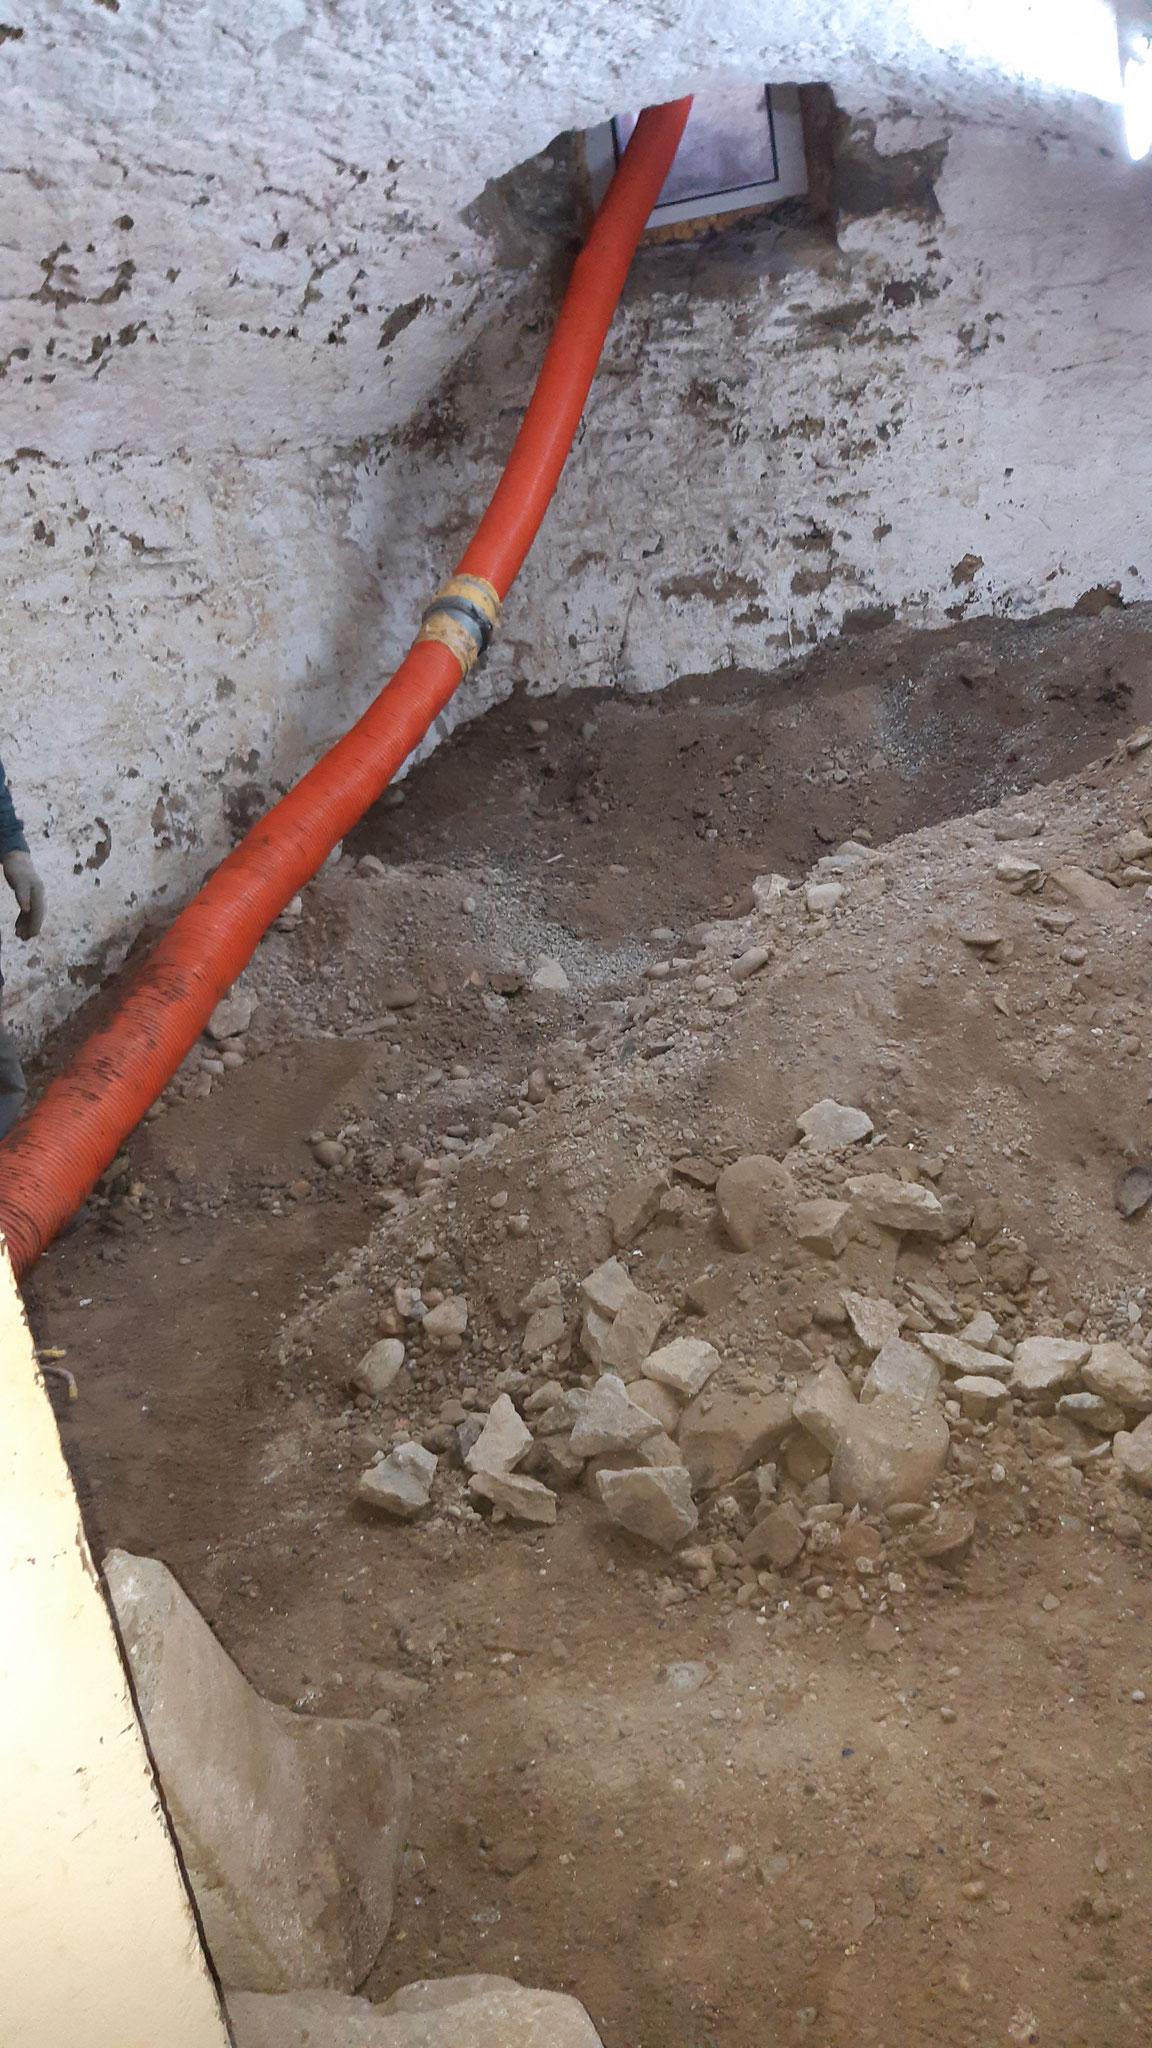 Kellerboden absenken mit Saugbagger, Altstadt Lenzburg AG